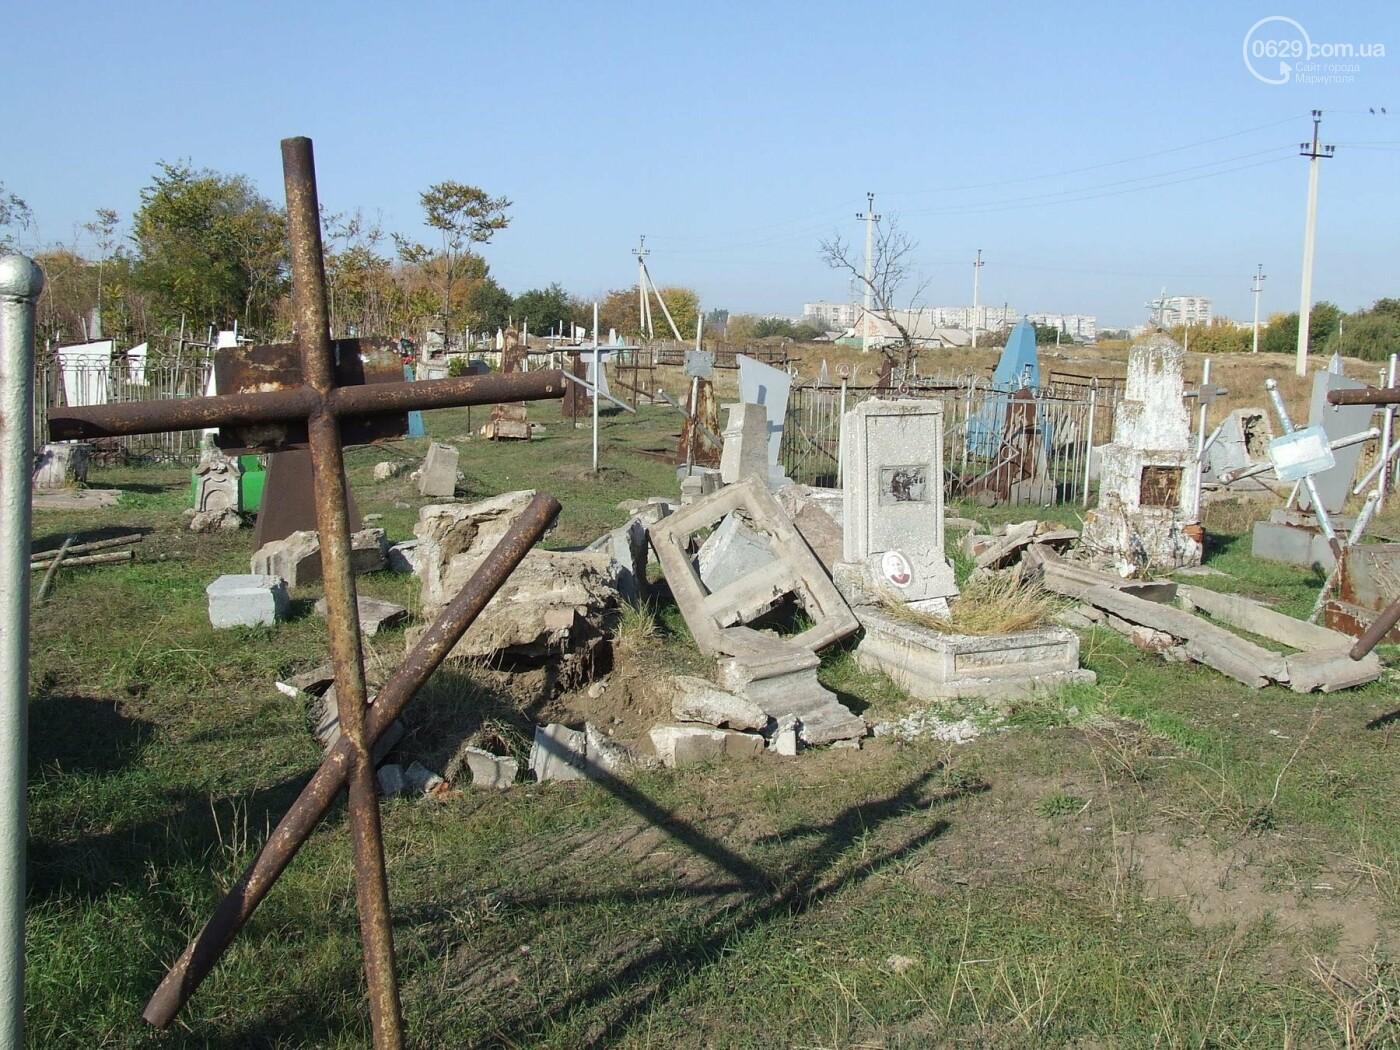 Вандалы разгромили могилы на самом старом кладбище Мариуполя, - ФОТО, фото-2